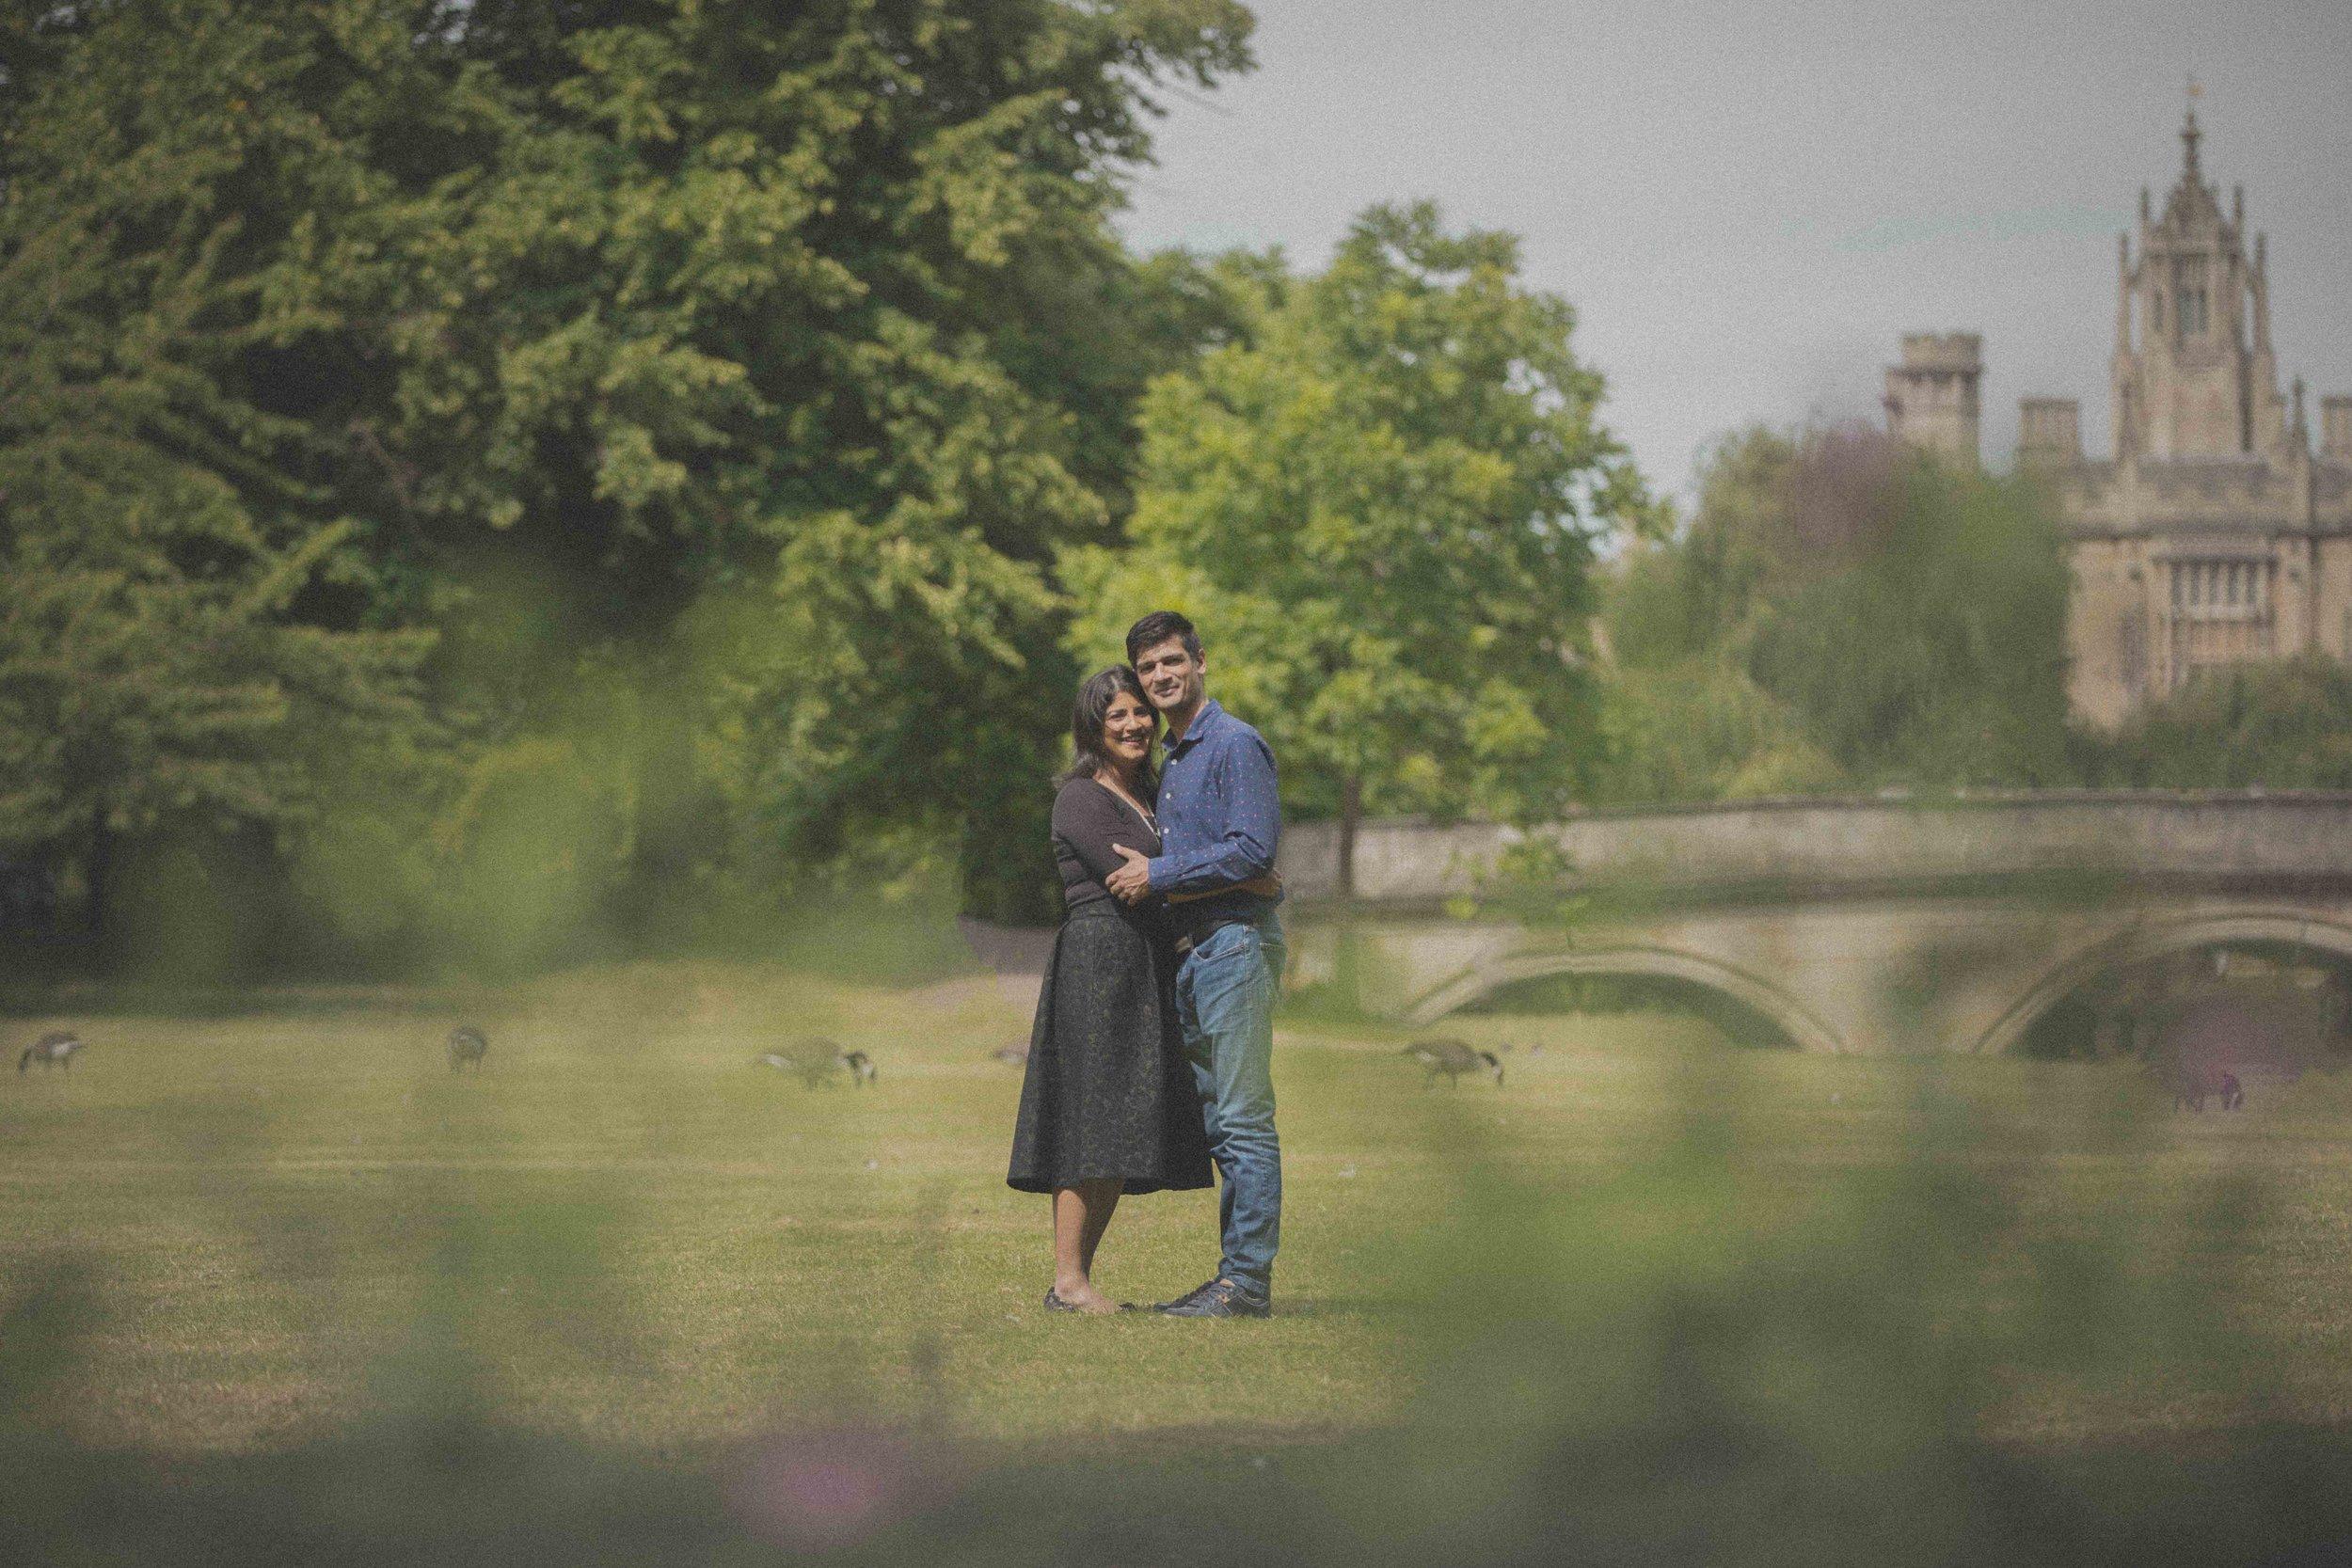 cambridge-pre-wedding-prewedding-engagement-photoshoot-shoot-photographer-asian-wedding-natalia-smith-photography-11.jpg